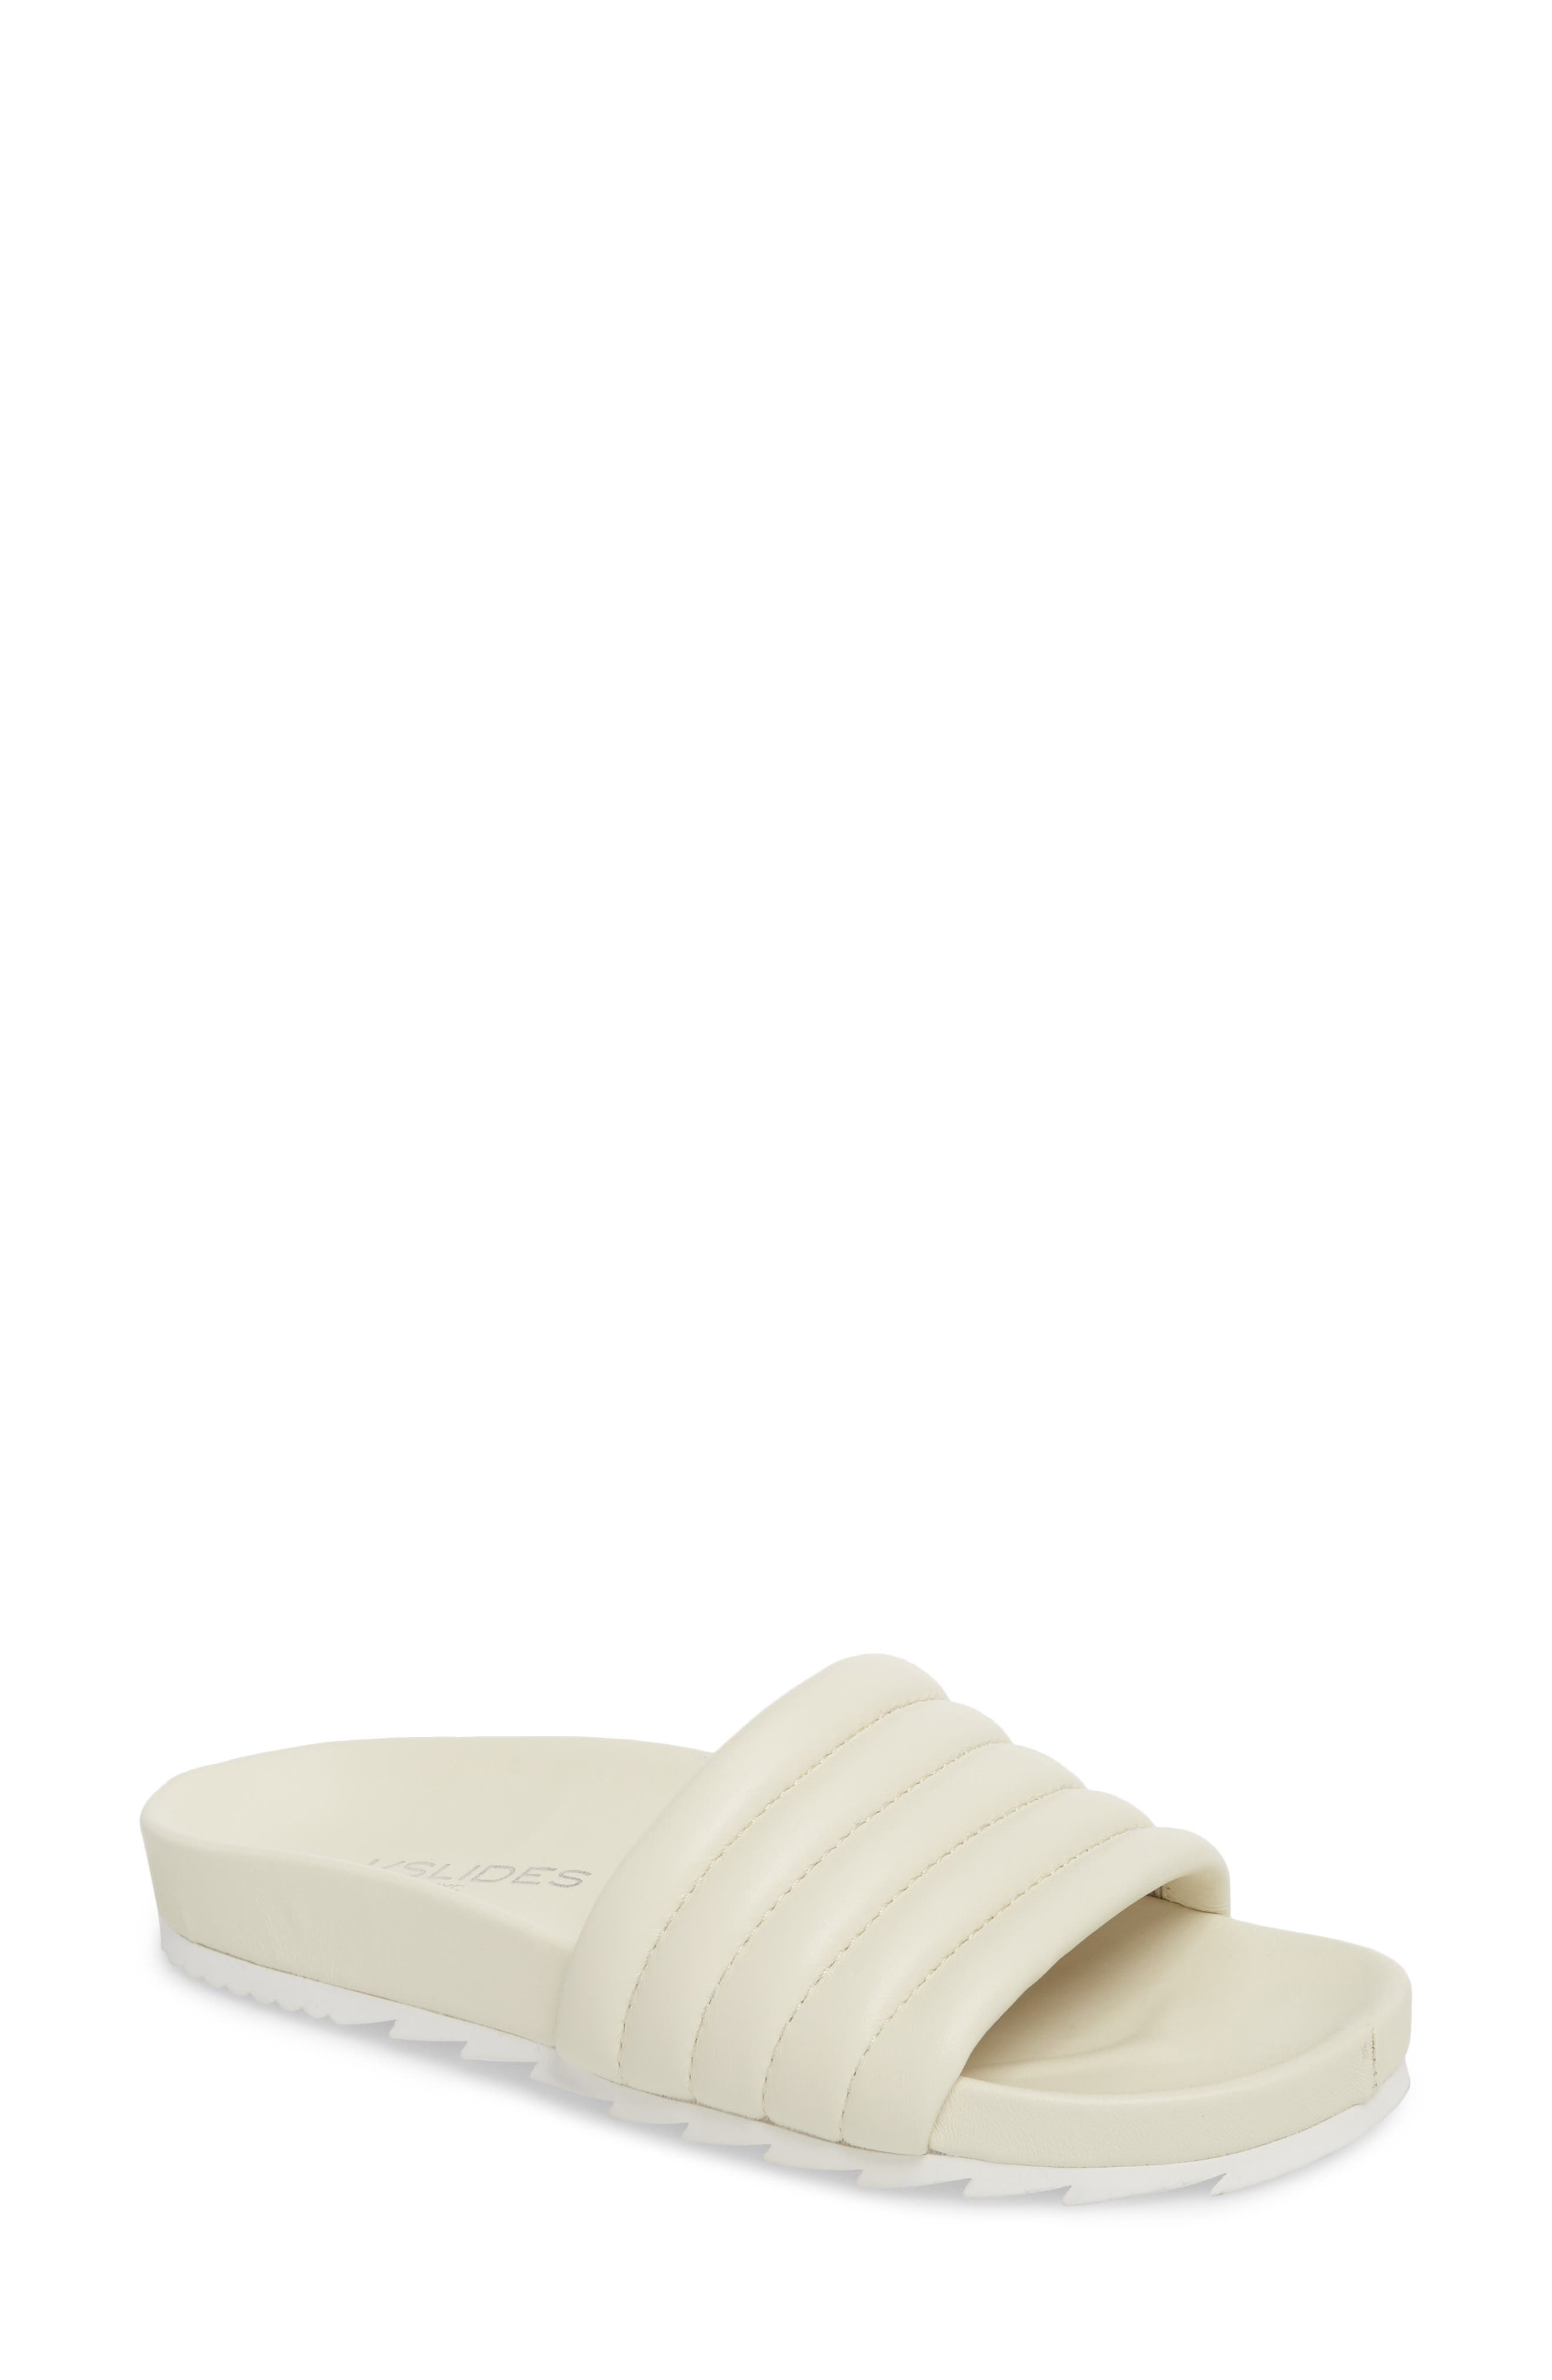 Eppie Slide Sandal,                         Main,                         color, Off White Leather